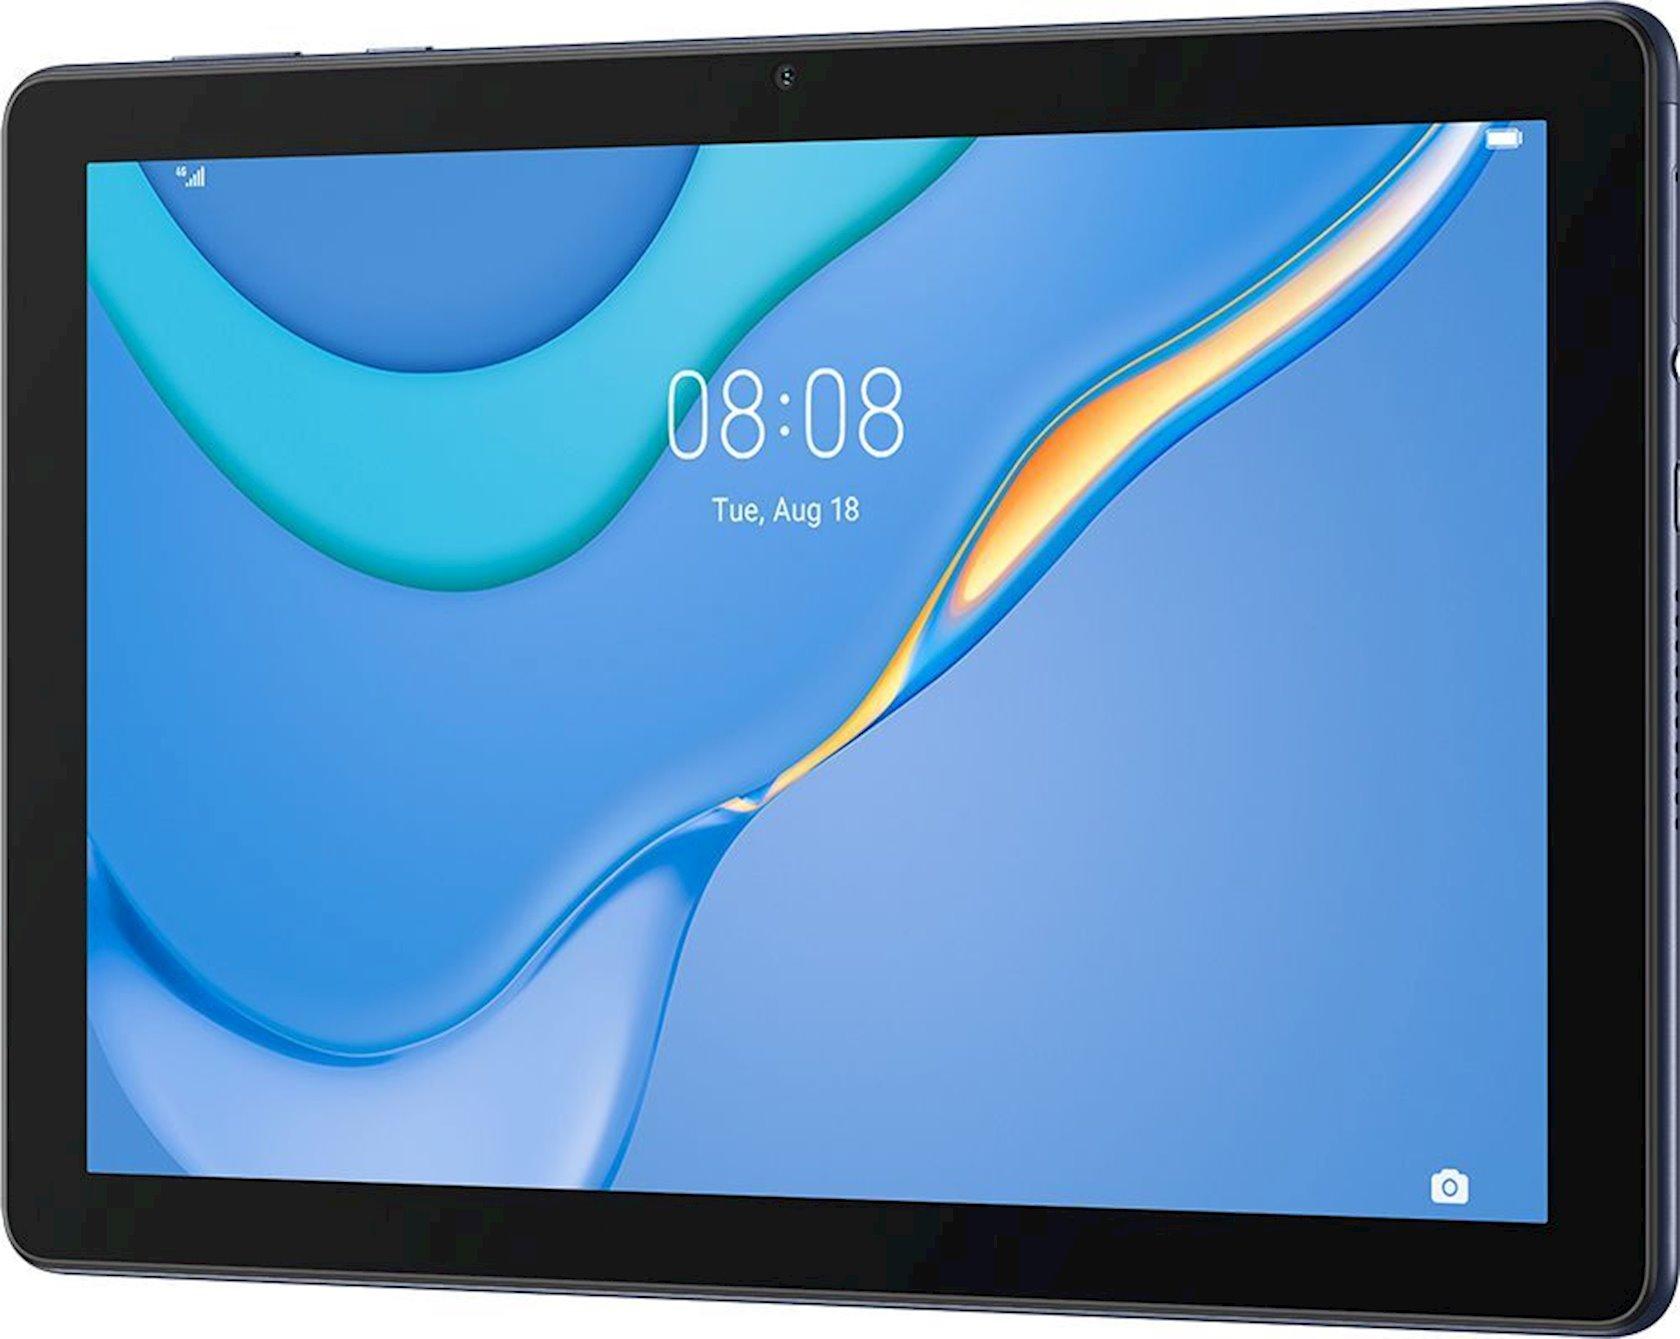 Planşet Huawei MatePad T10S 3/64GB Göy